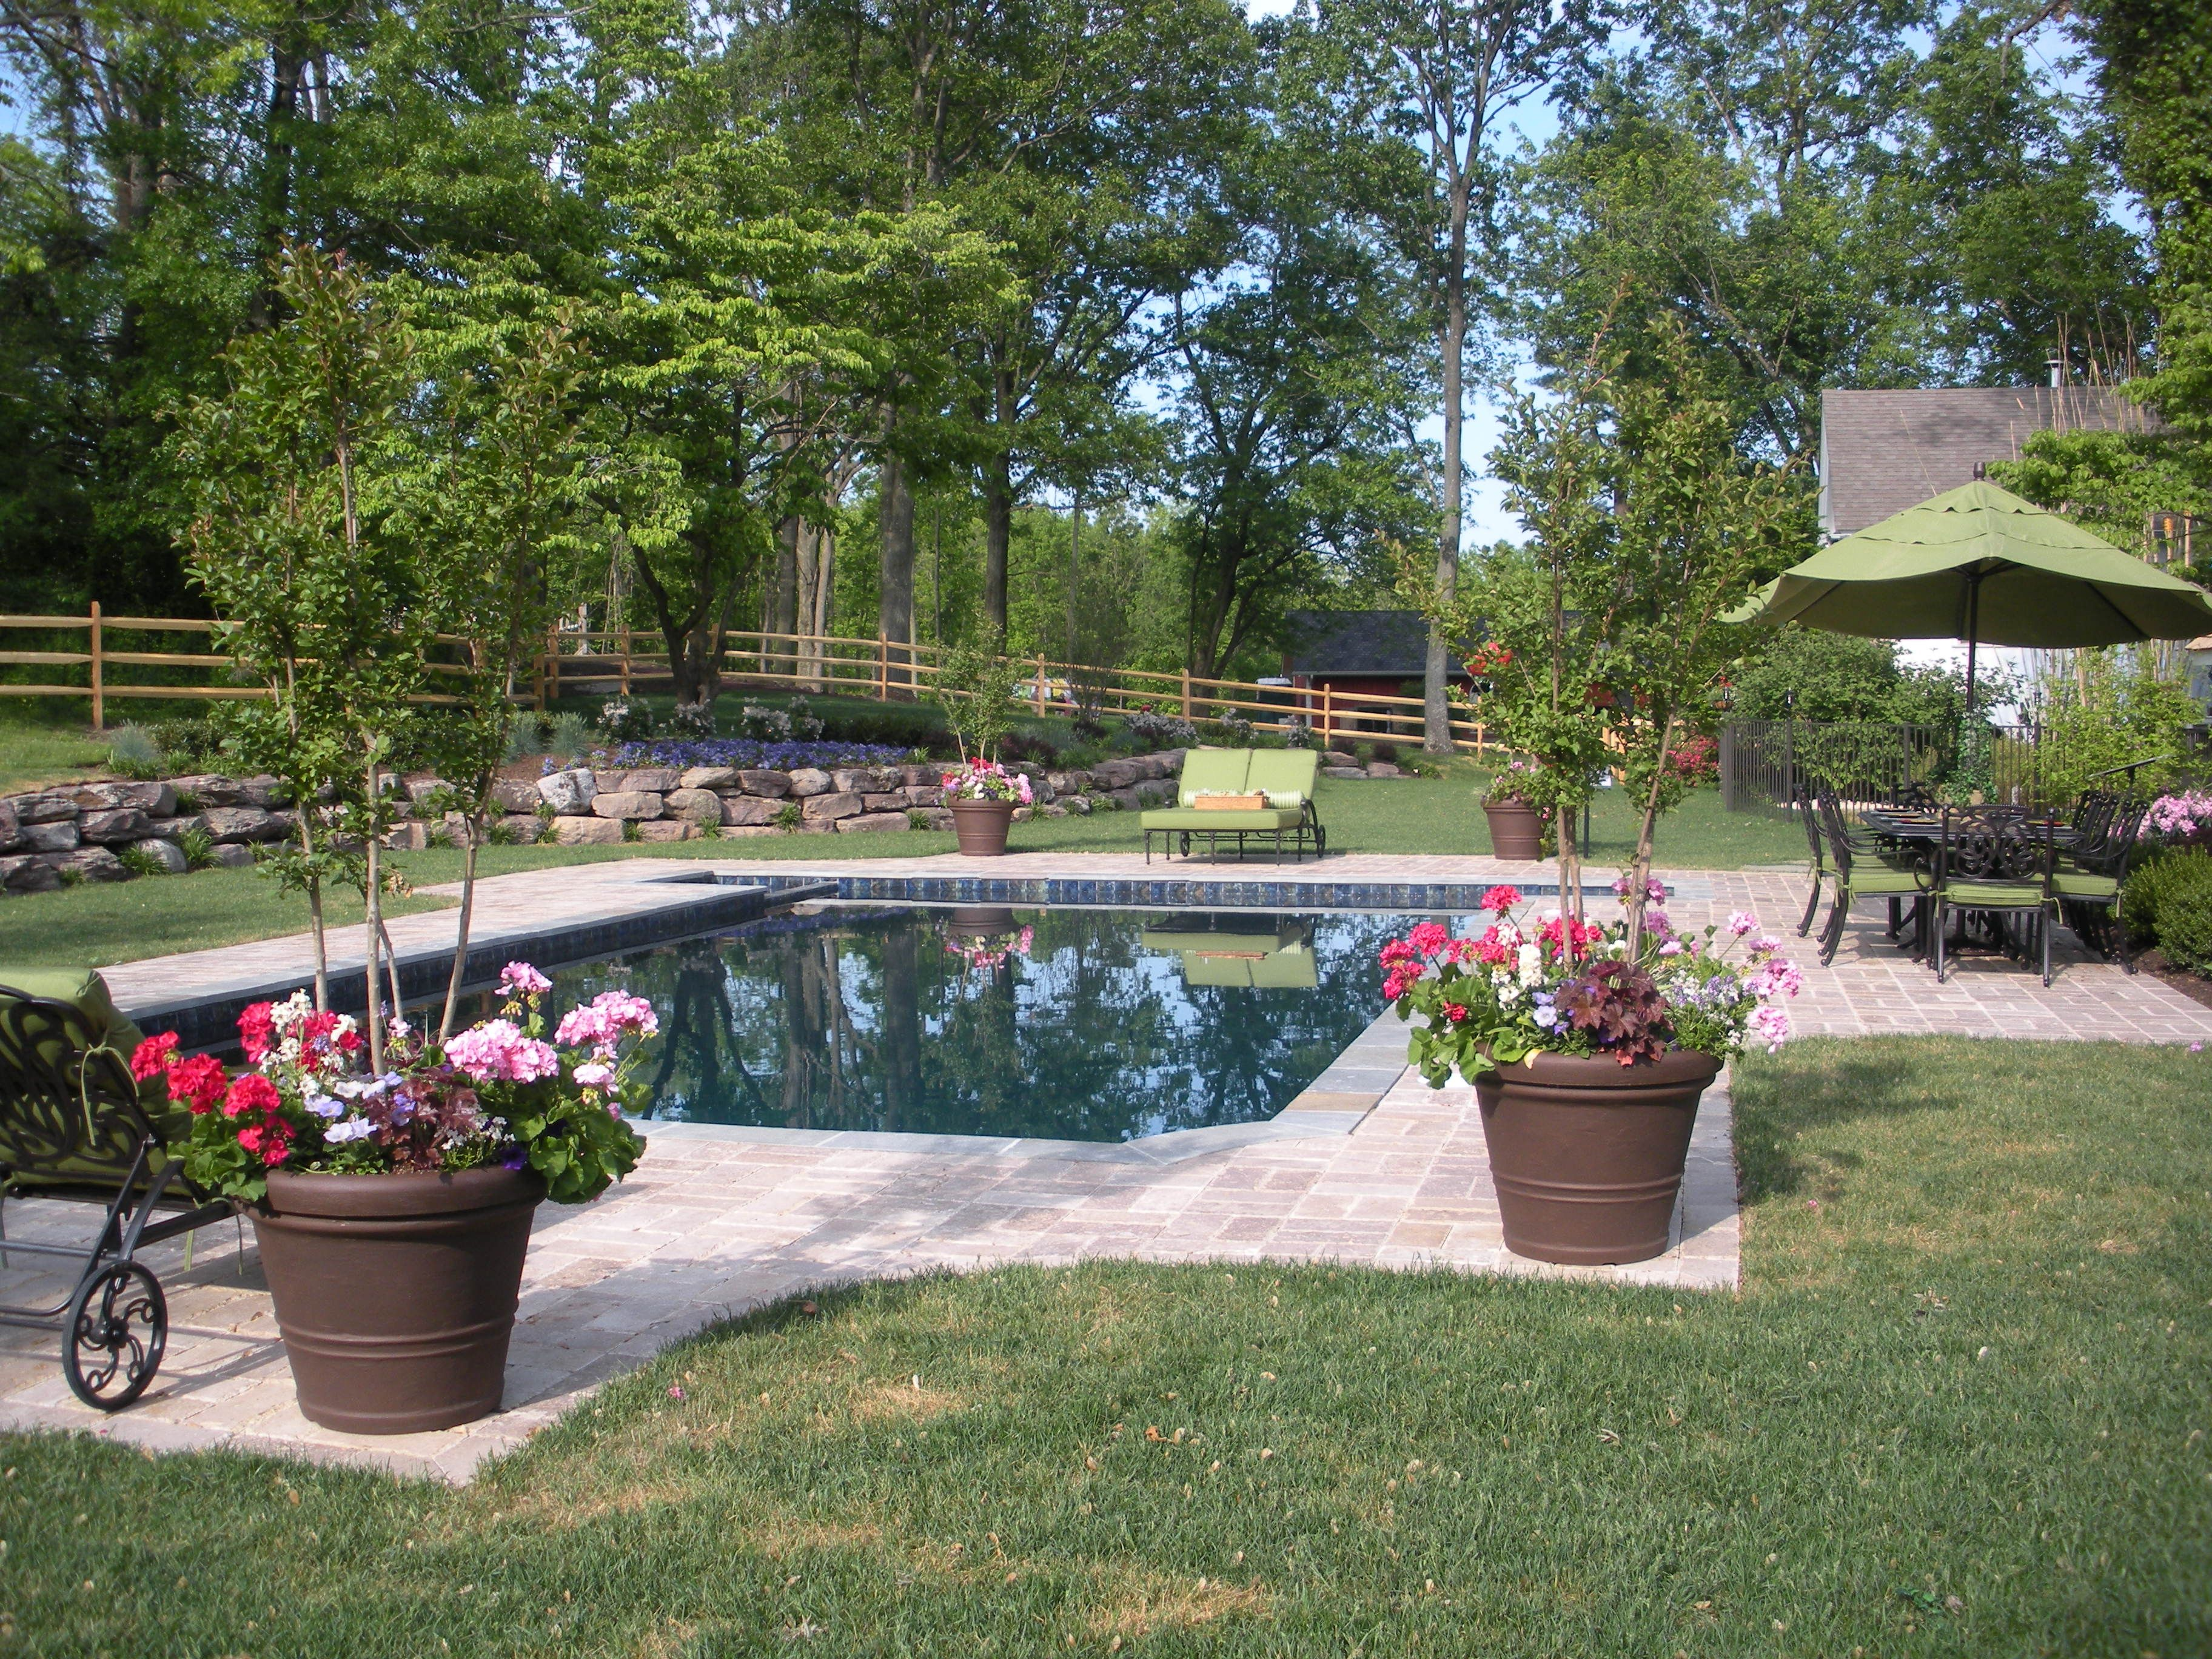 Designer house pool patio design plsblue new hope pa for Garden training pool